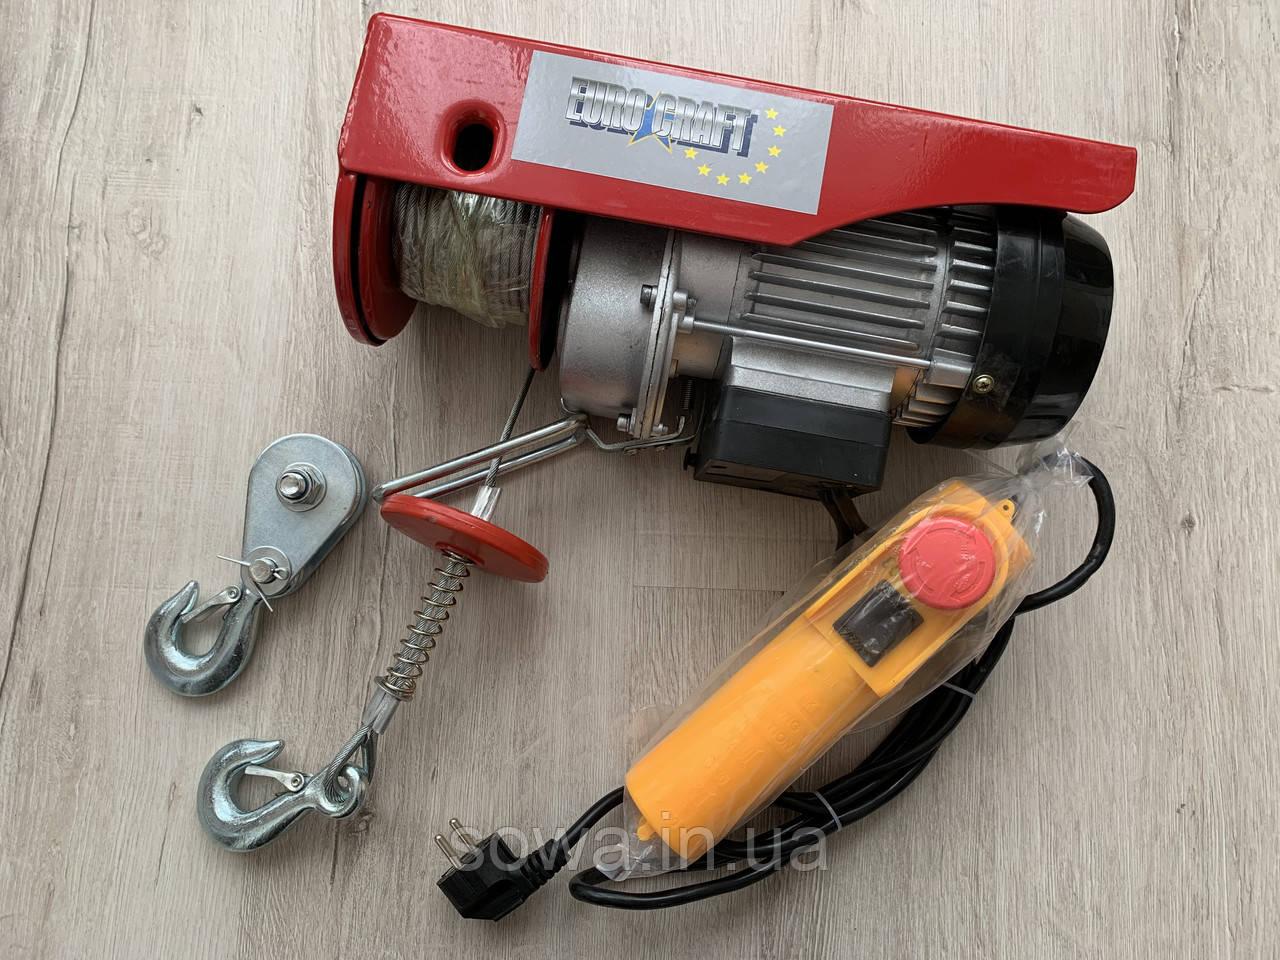 ✔️ Тельфер электрический Euro Craft HJ202  | 150/300kg